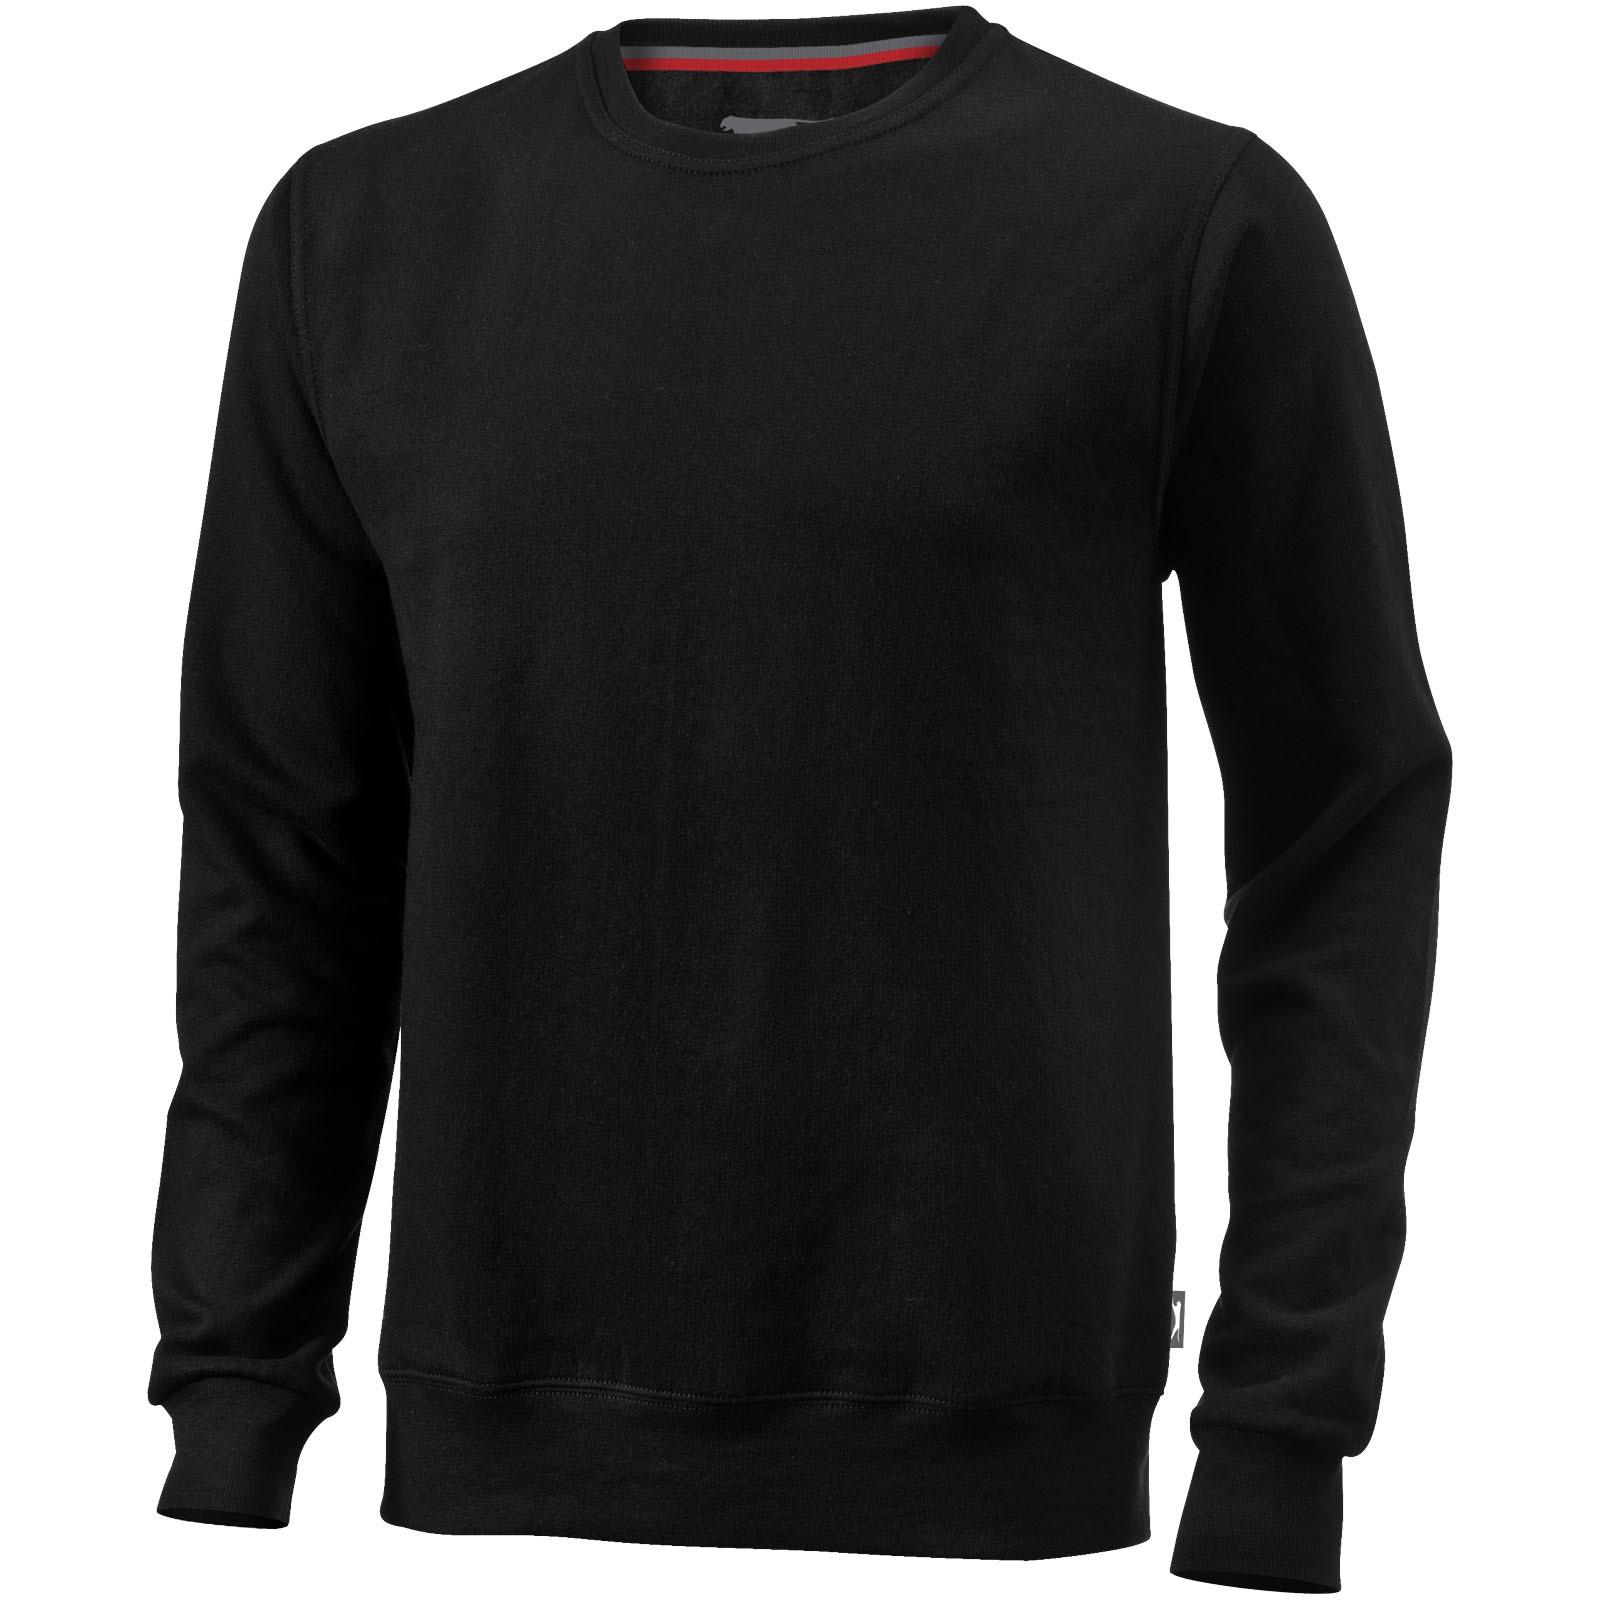 Toss crew neck sweater - Solid black / S